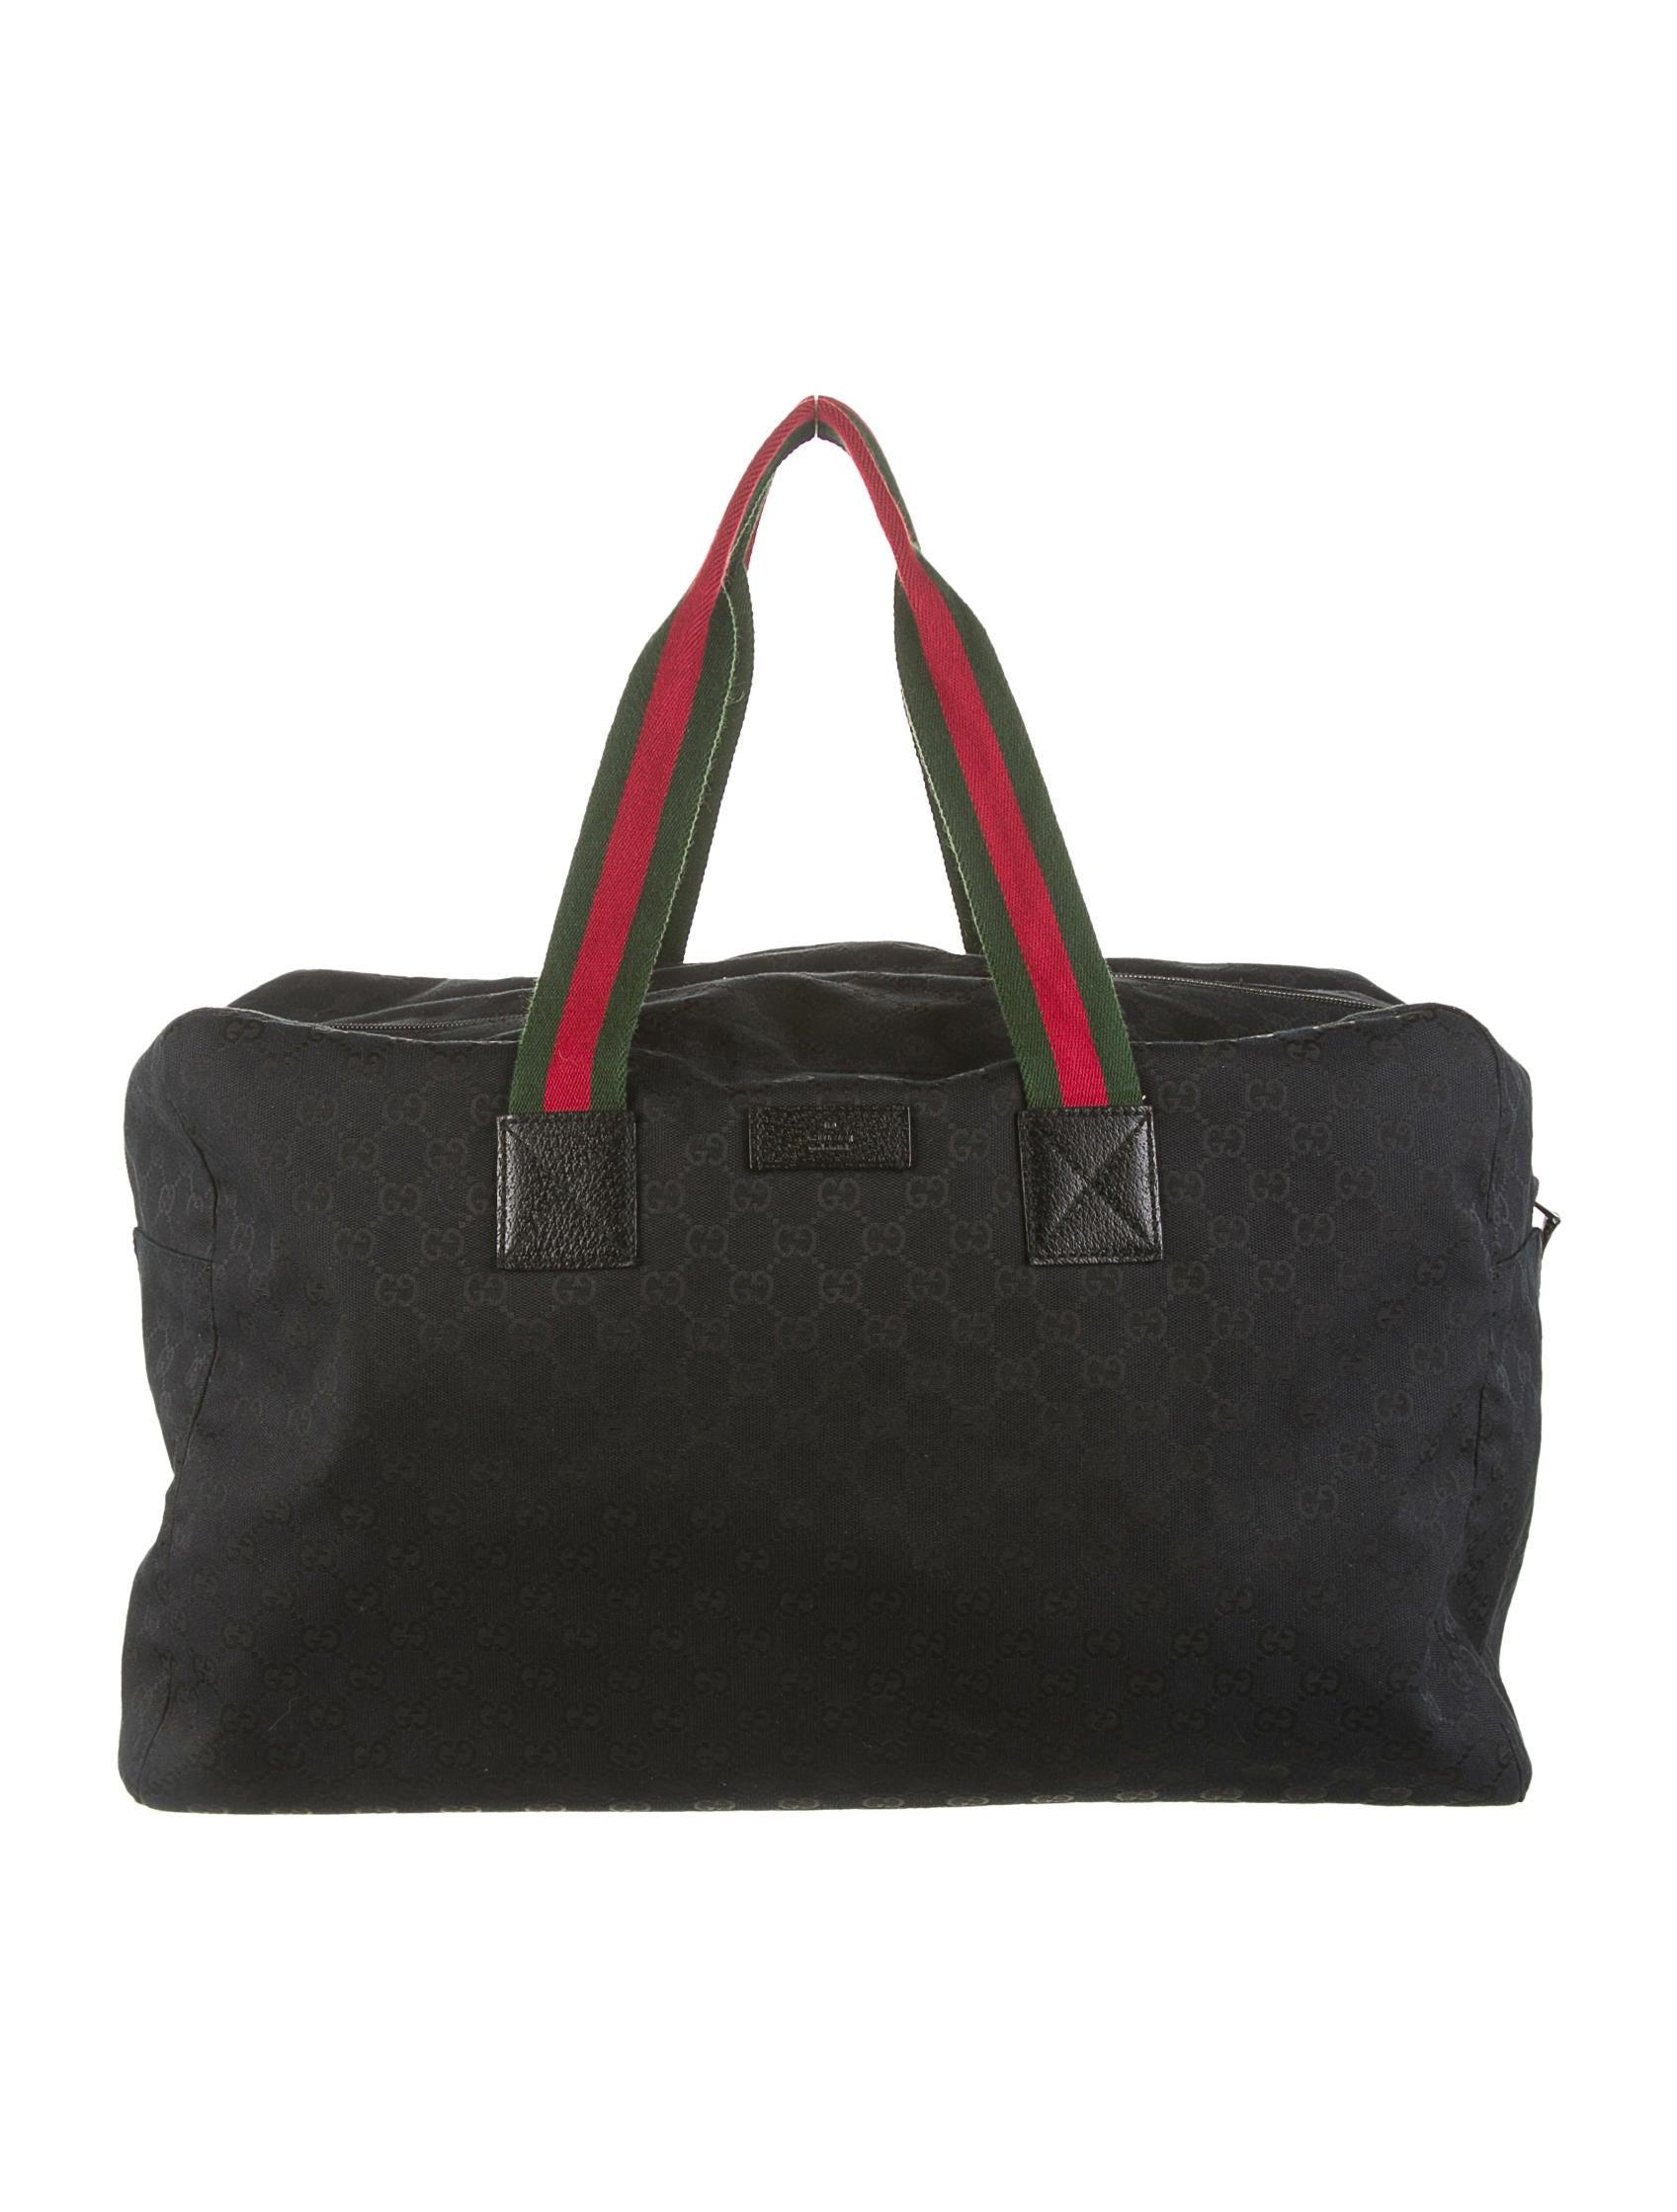 gucci large gg duffle bag bags guc50182 the realreal